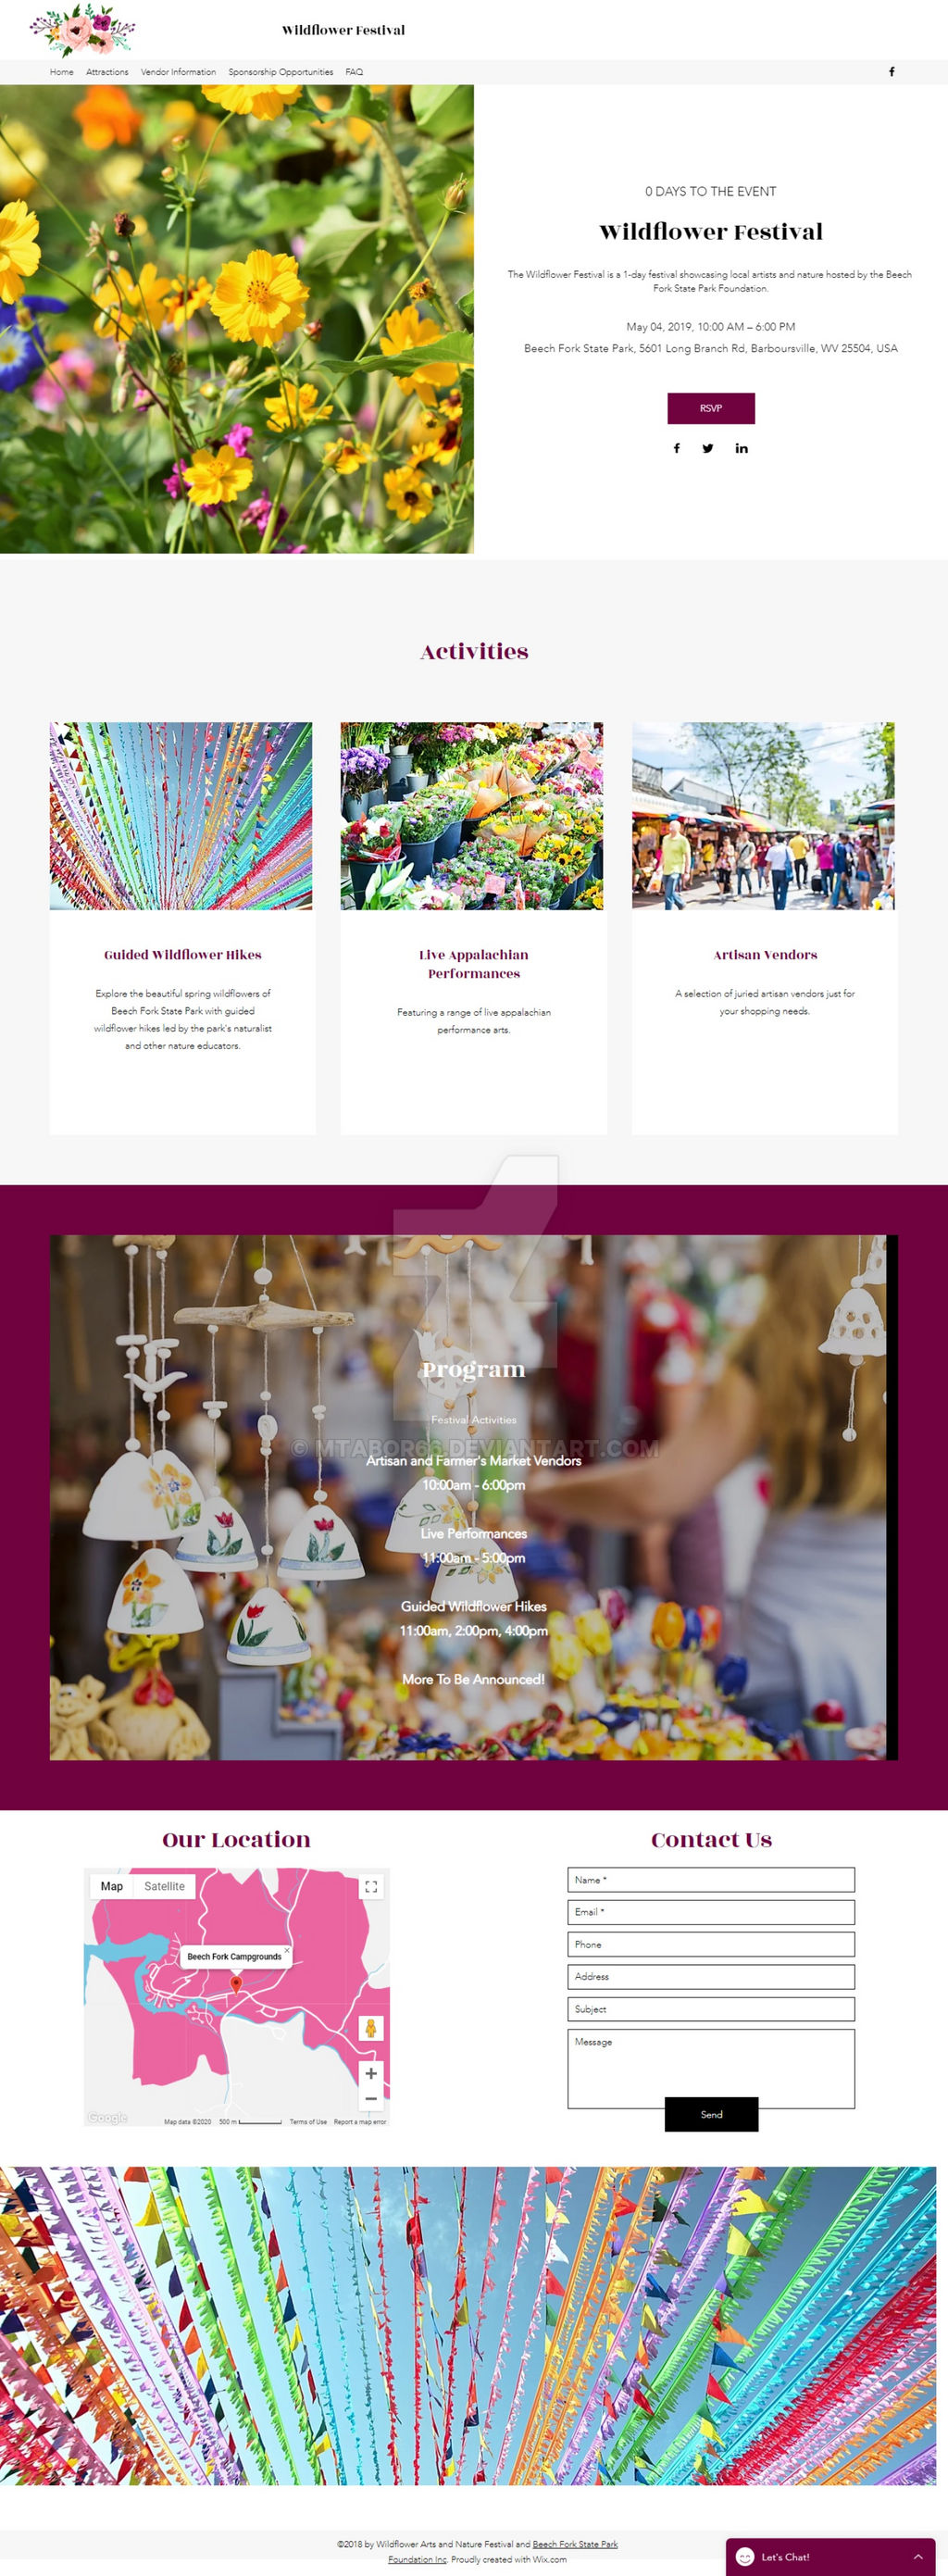 Widlfower Festival Website Design